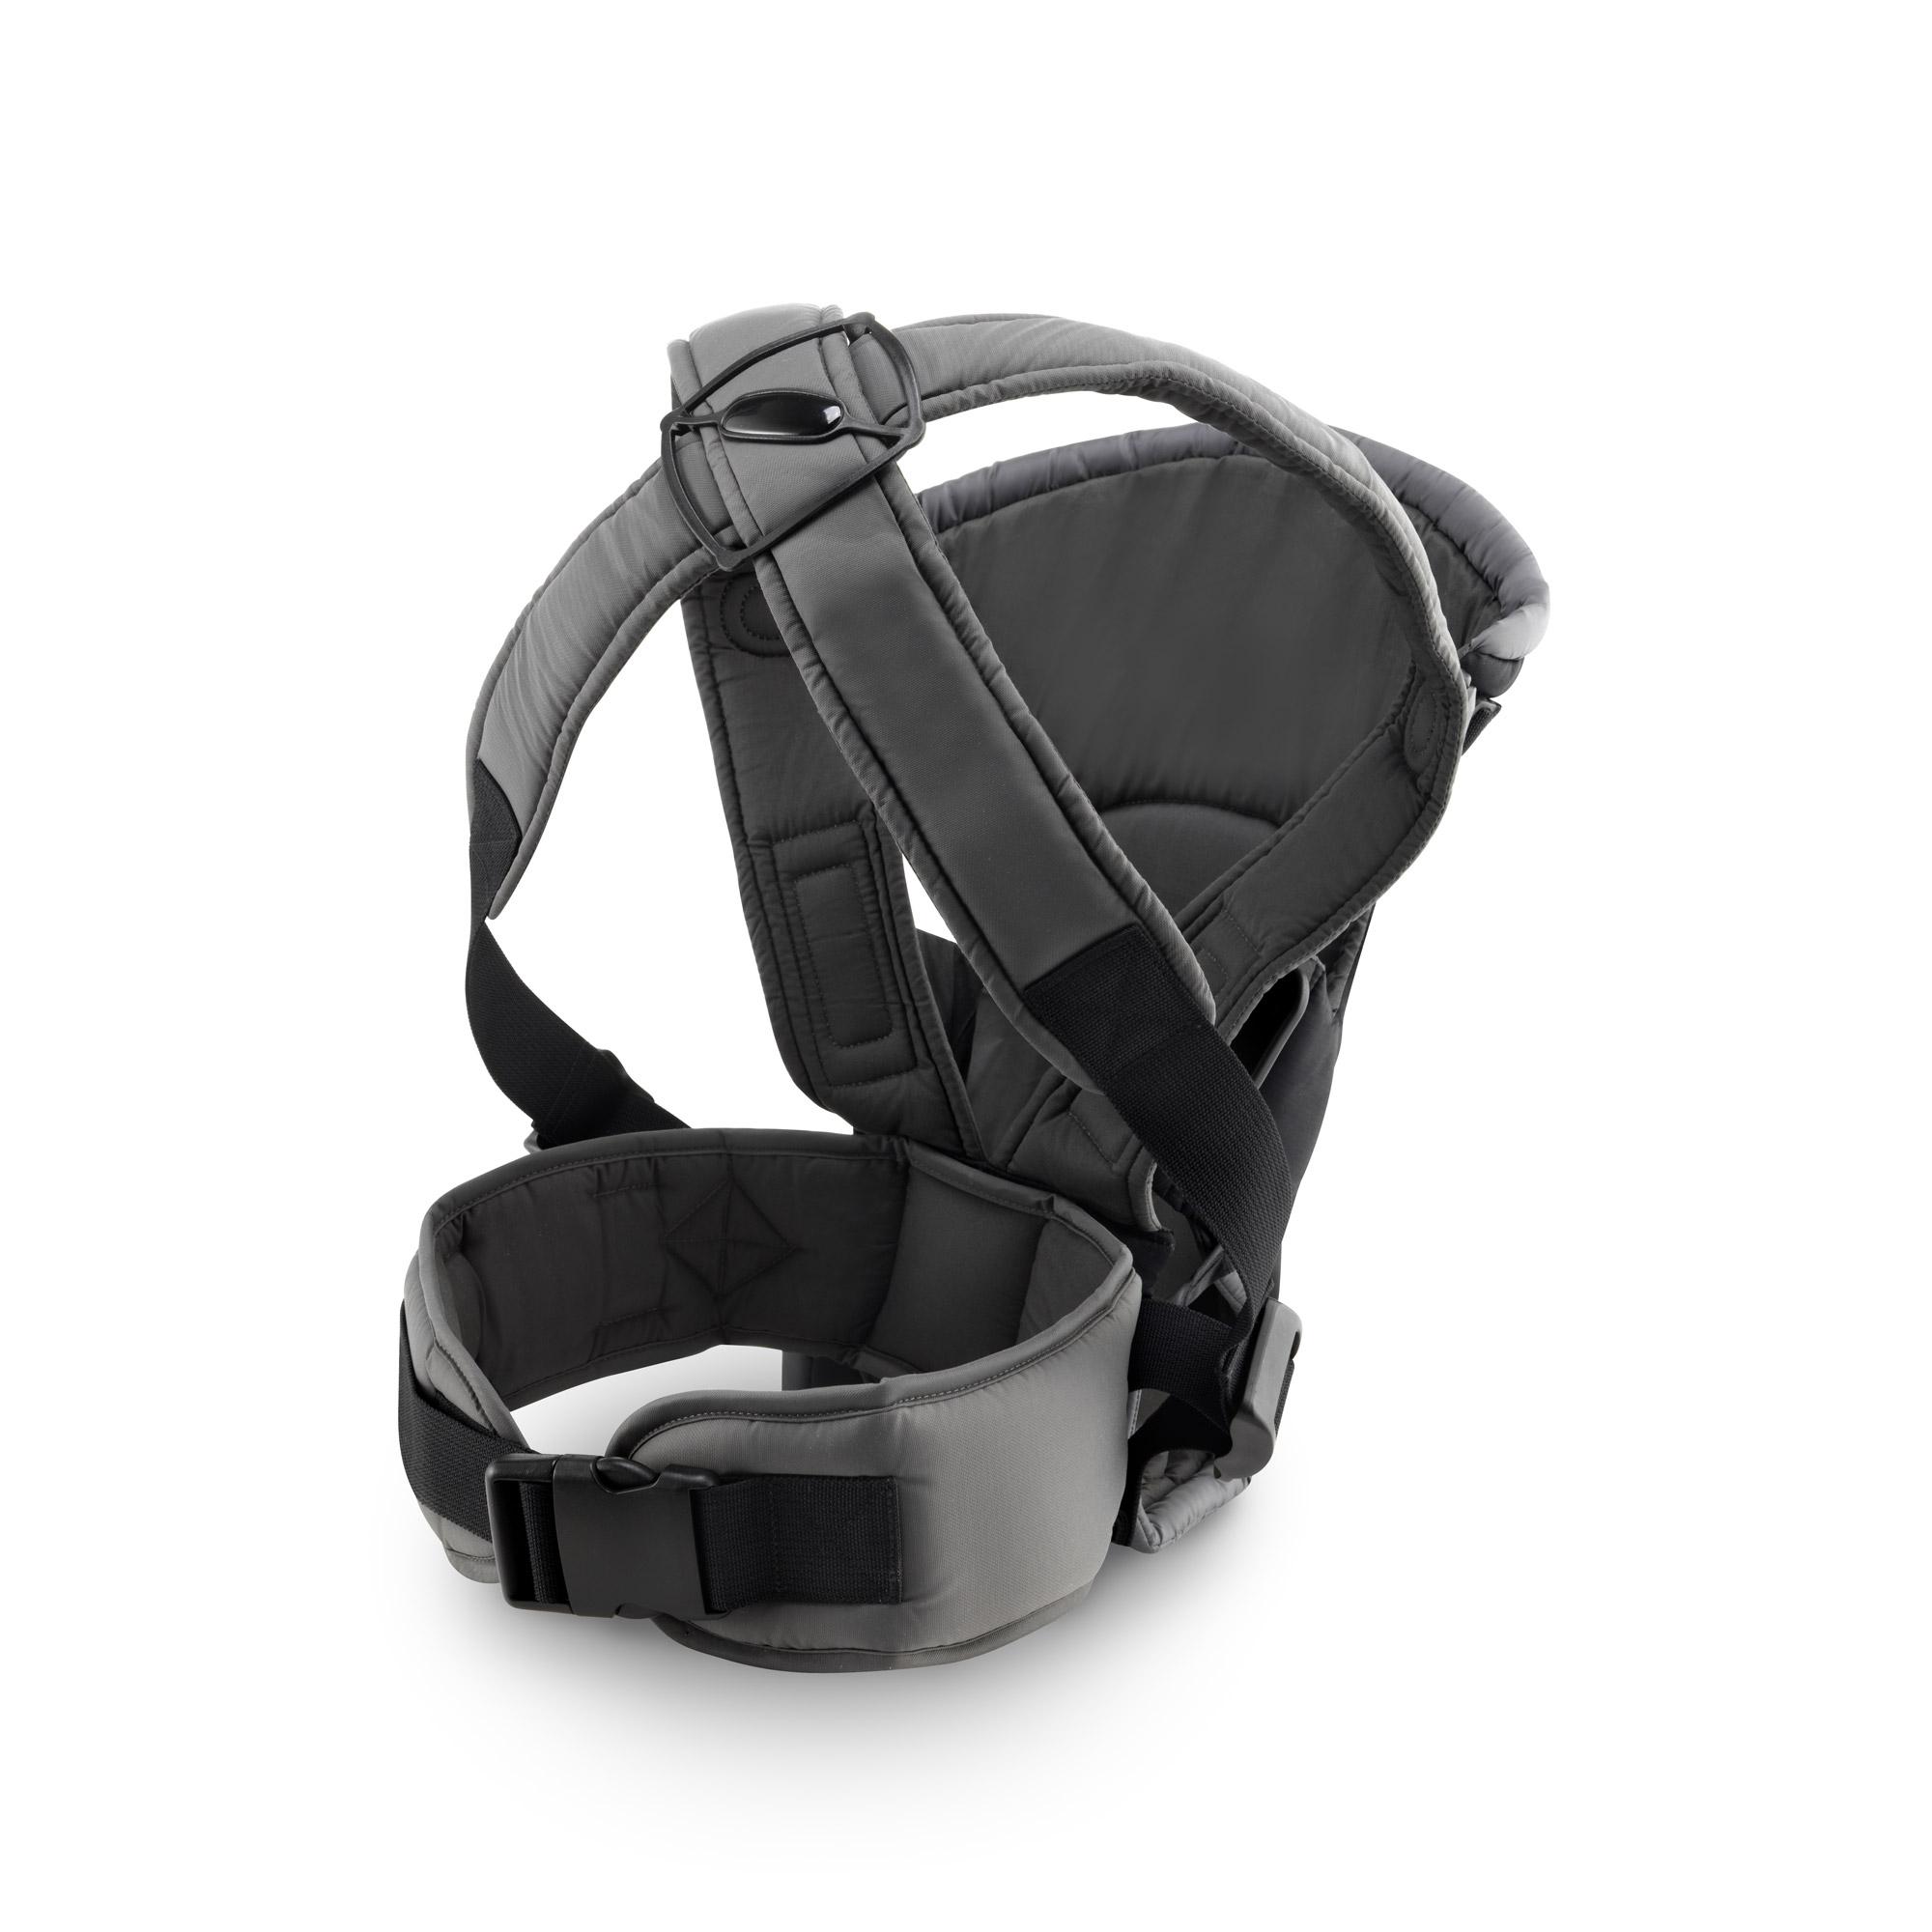 Porte b b gris de aubert concept porte b b ventral aubert - Porte bebe aubert concept ...